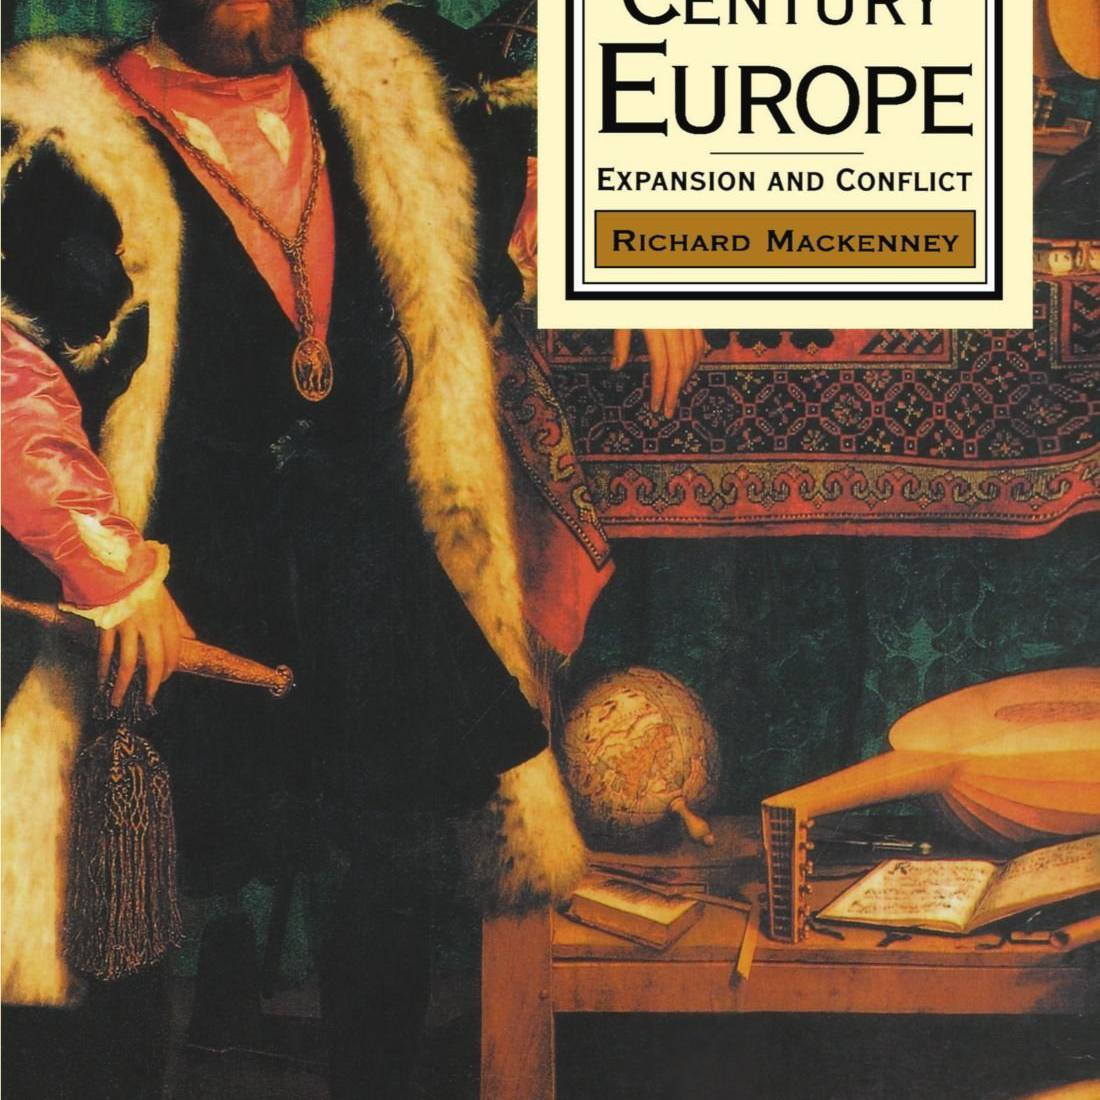 Europa del siglo XVI 1500-1600 por Richard Mackenney